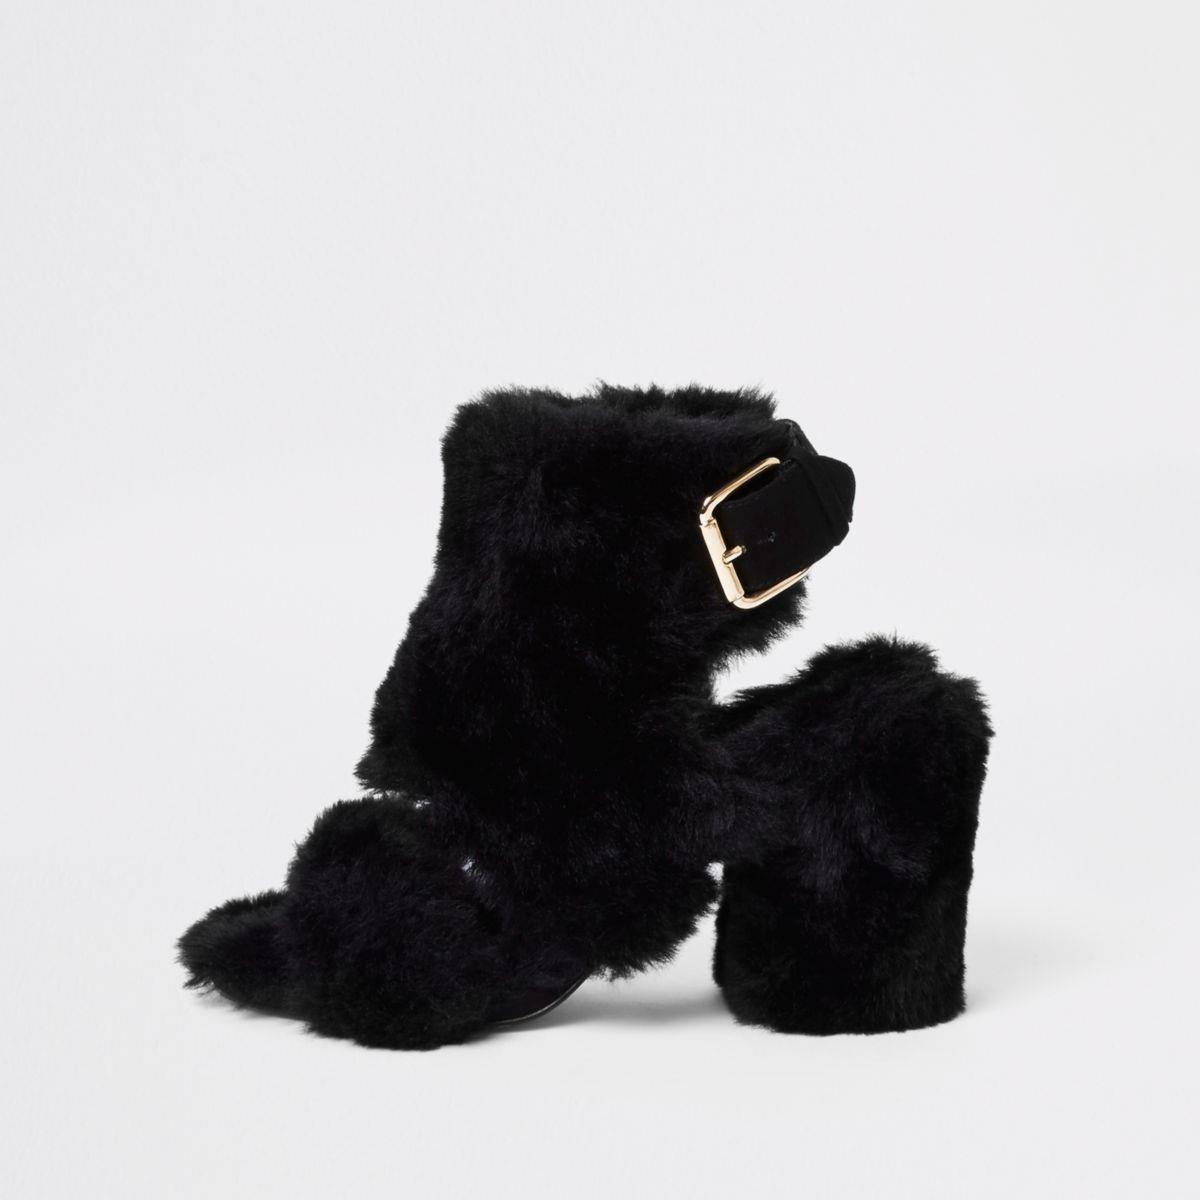 Black faux fur block heel shoe boots